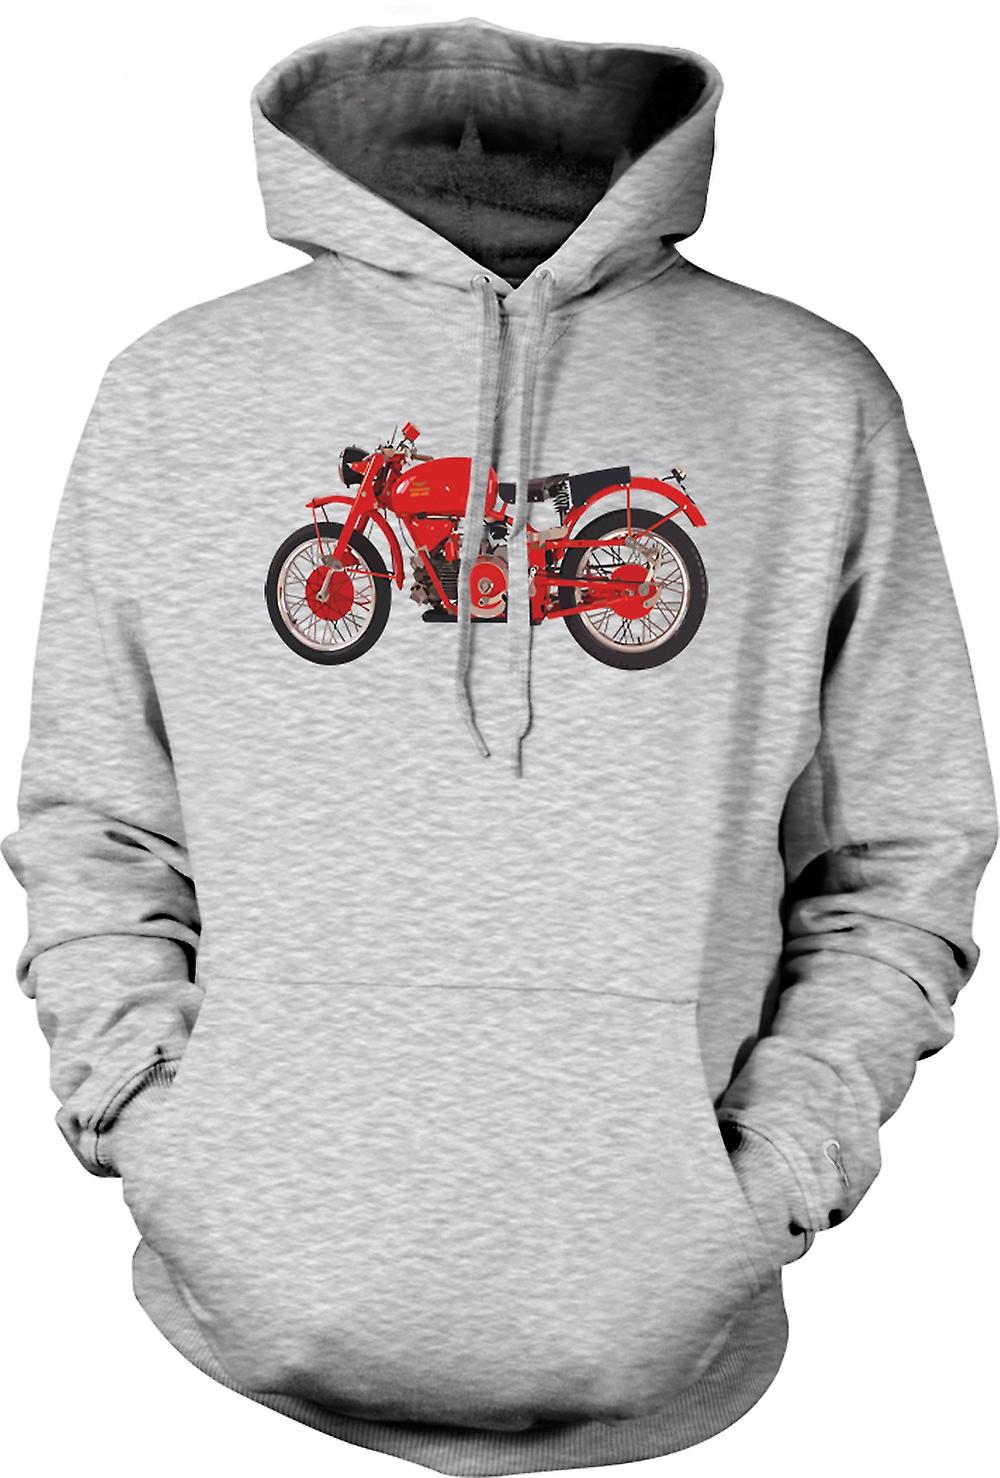 Mens Hoodie - Moto Guzzi Taranto 56 Col - Bike